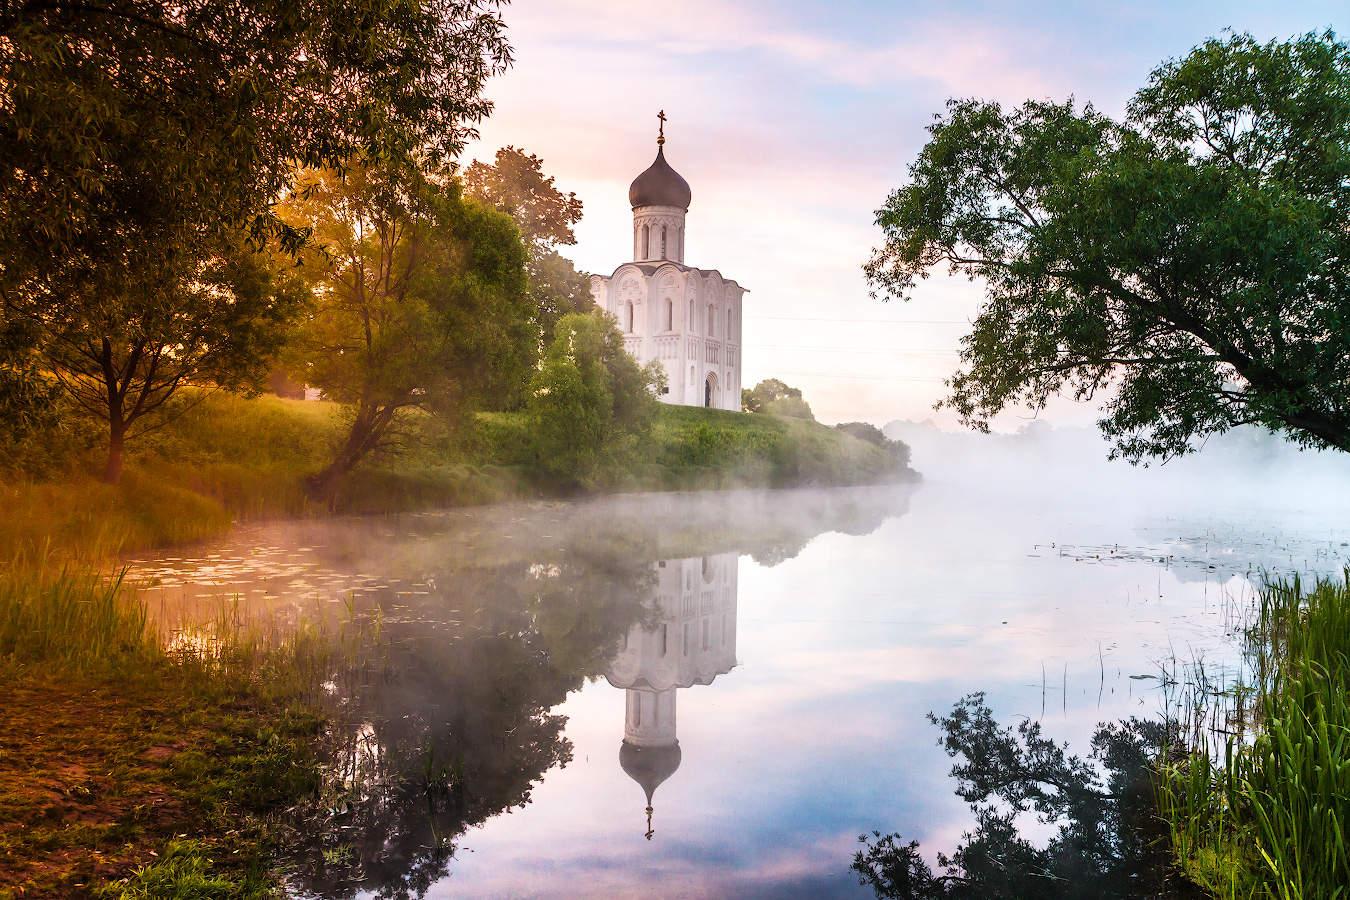 картинки церквей на природе